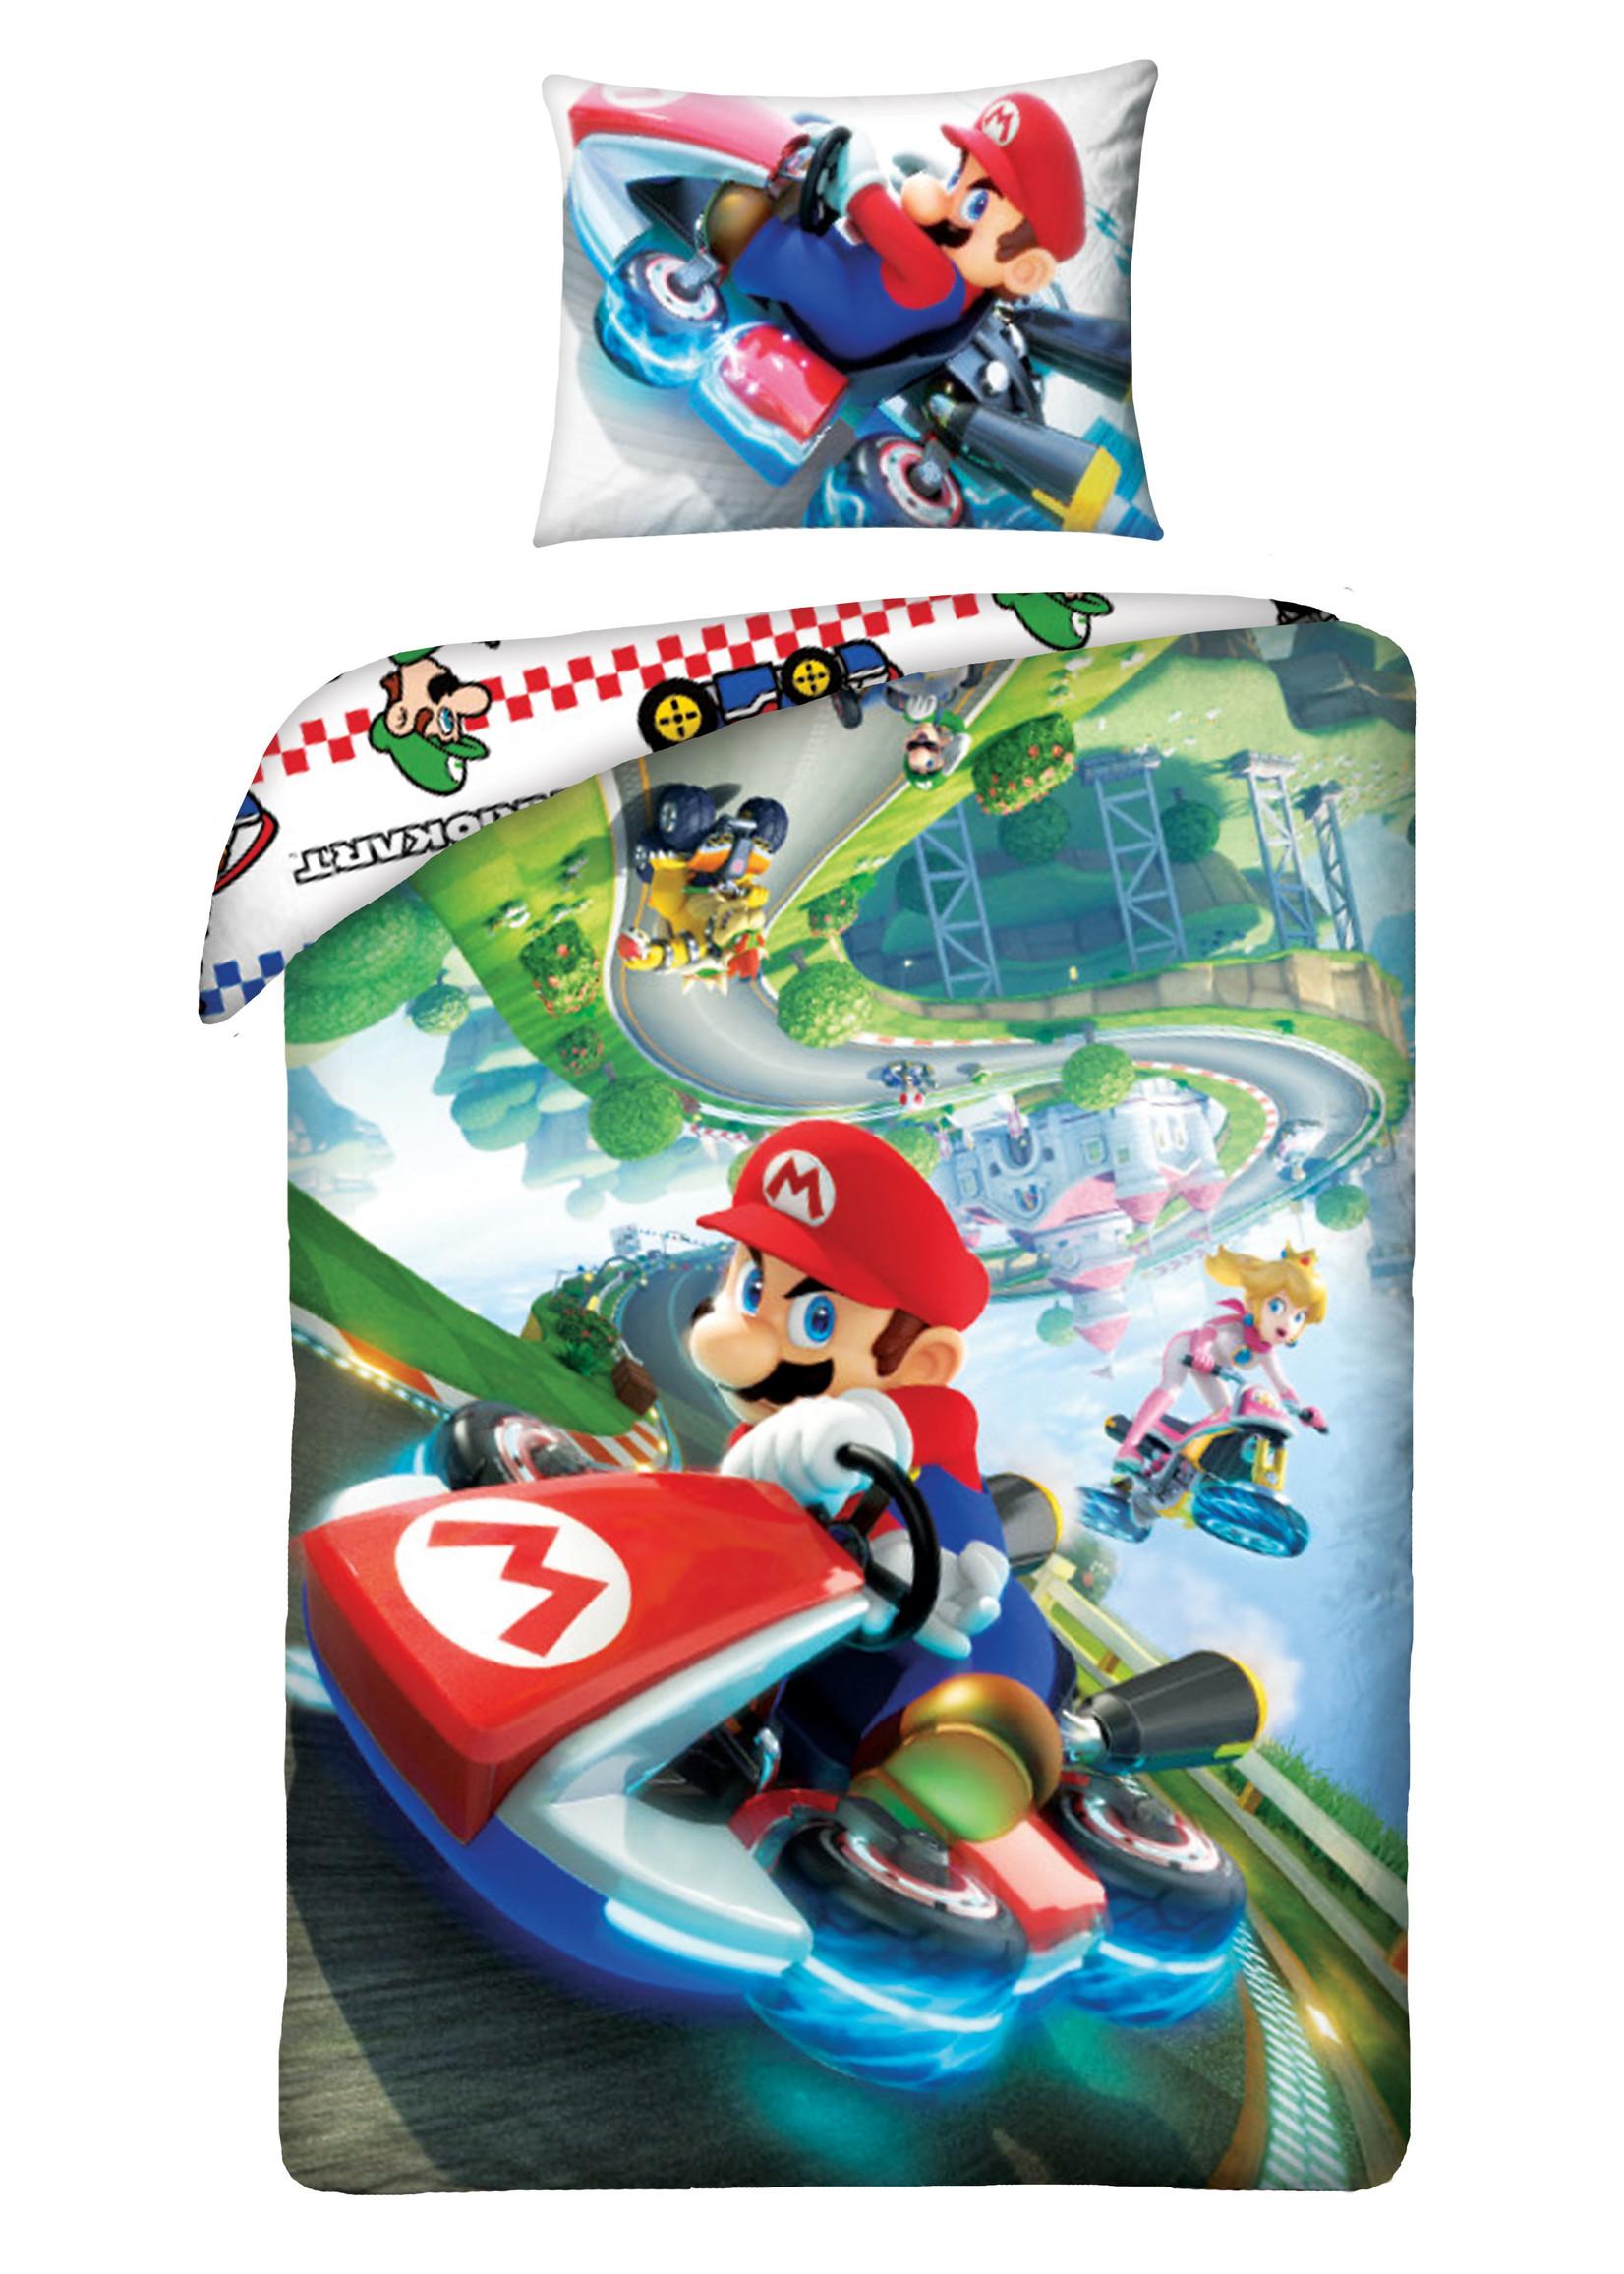 Nintendo Super Mario Dekbedovertrek 140x200